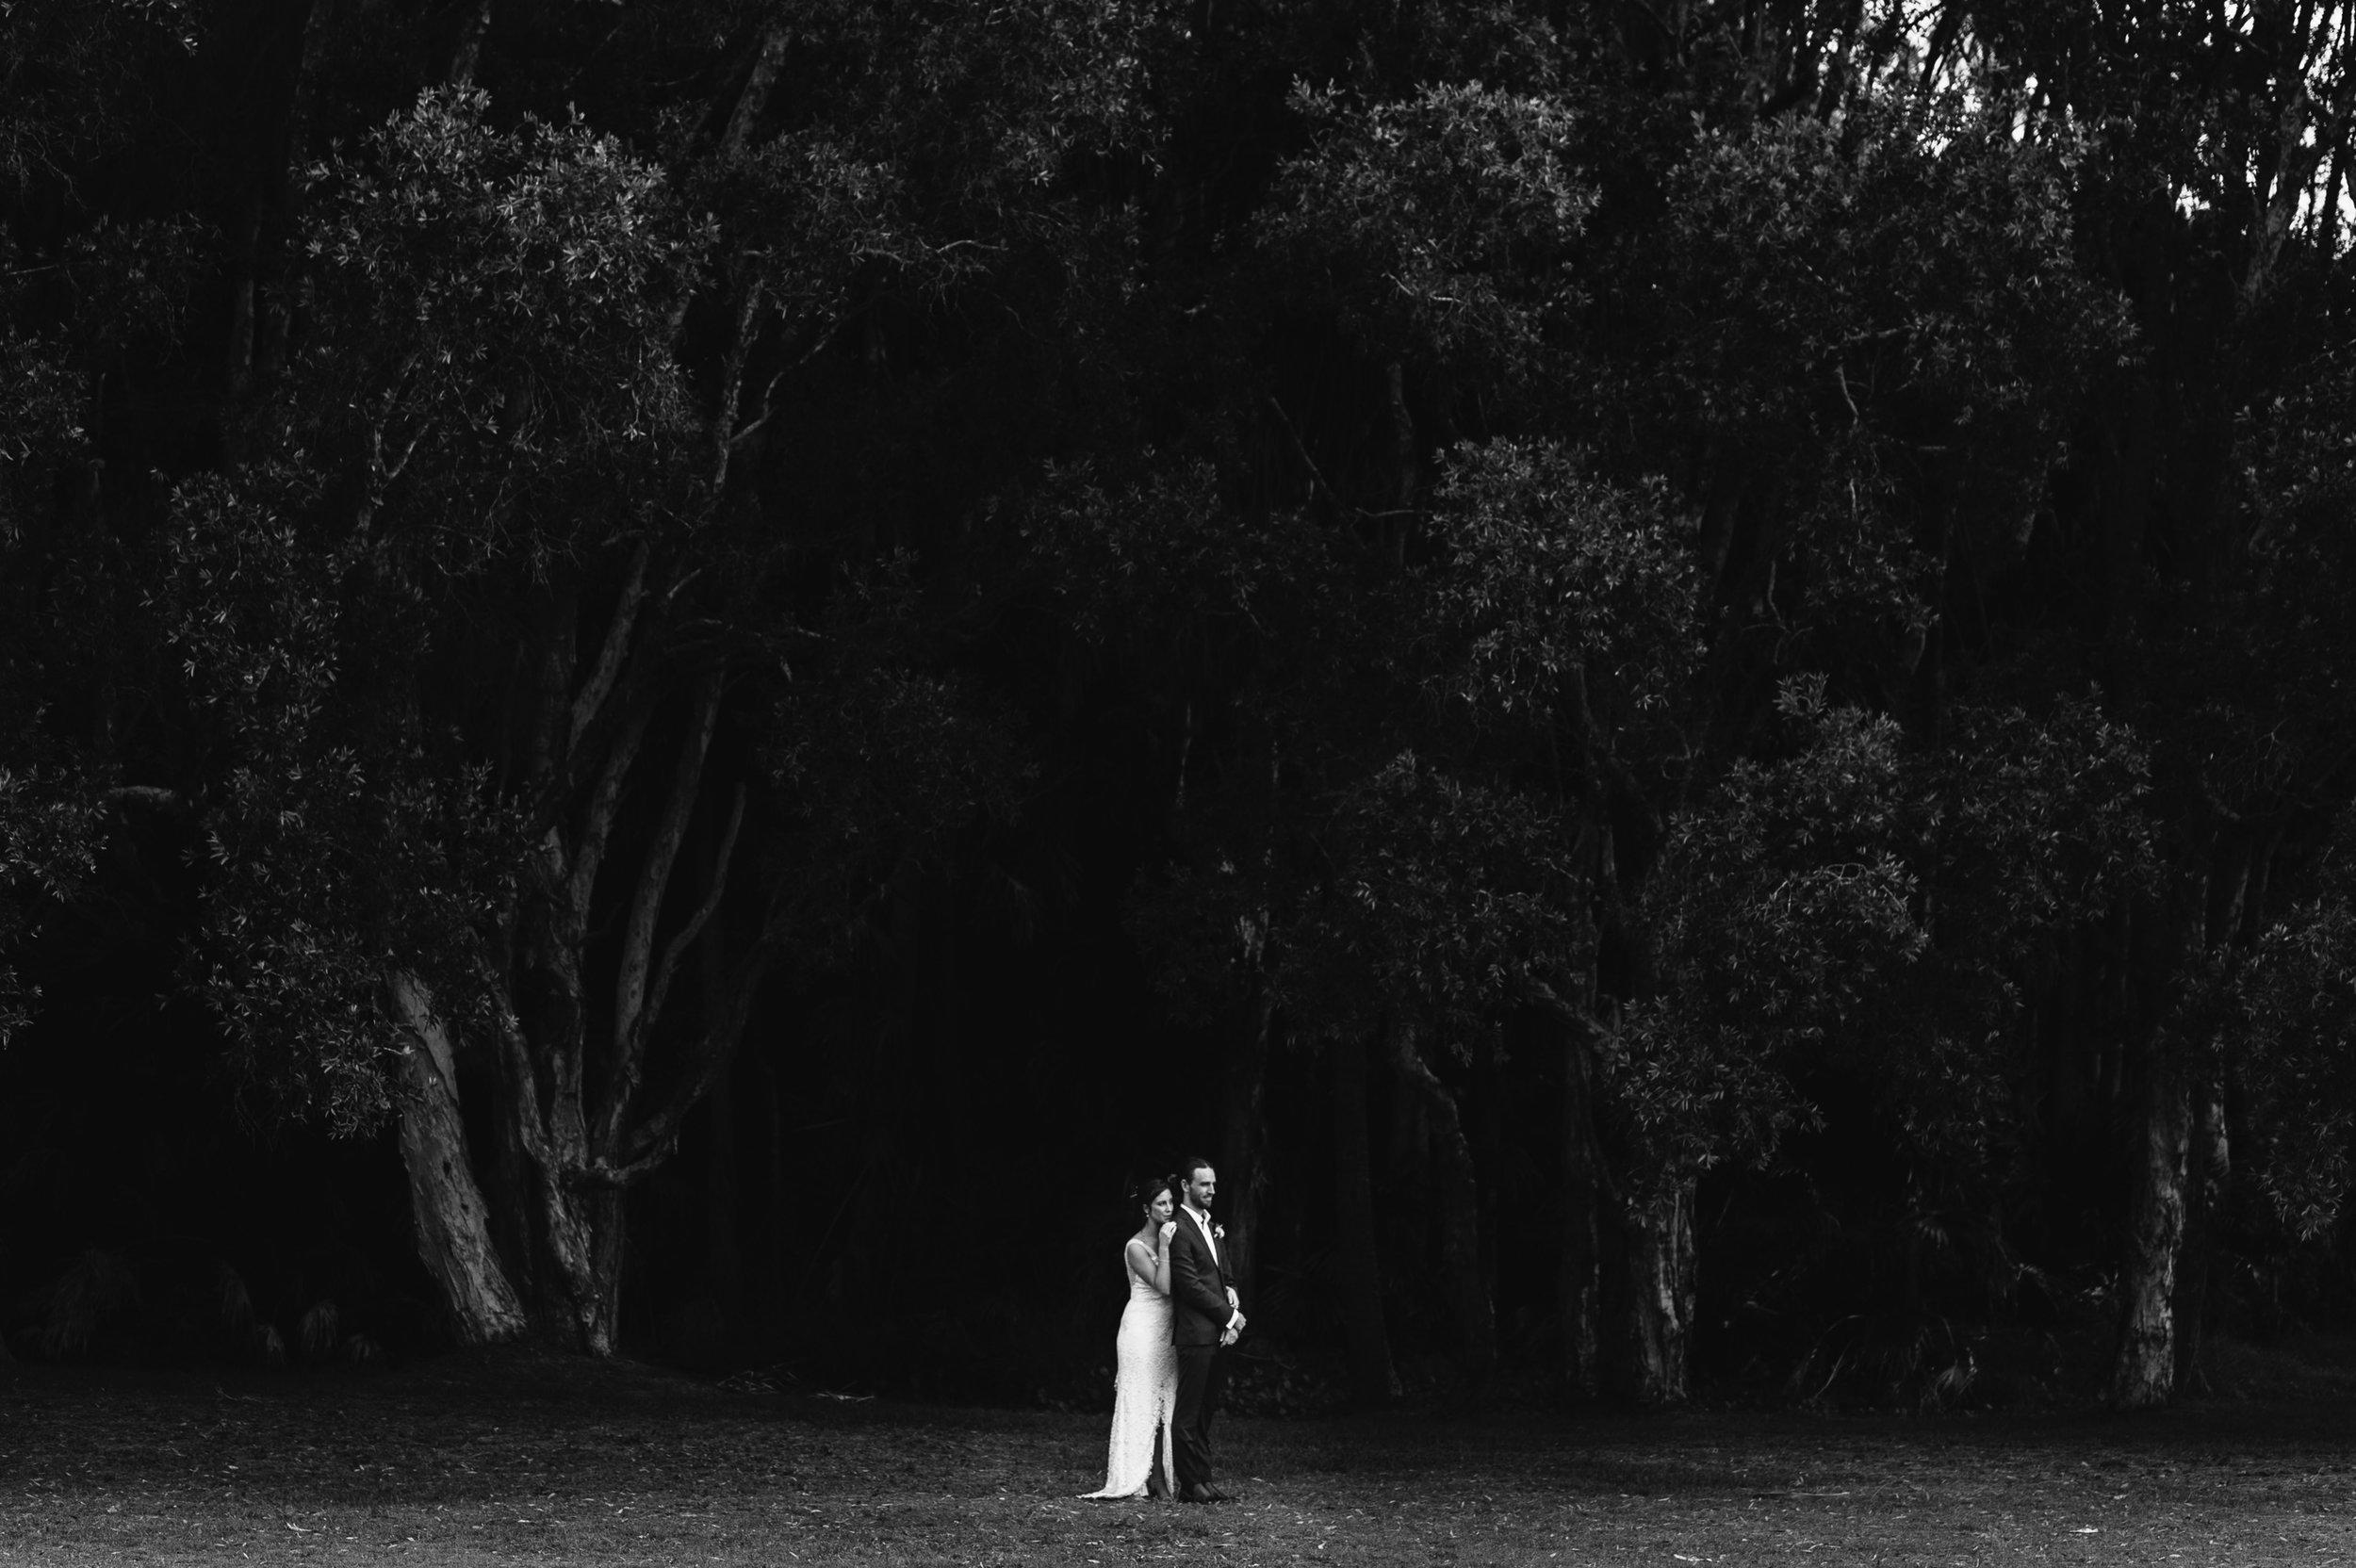 weddings by atelier photography-wedding-29.jpg